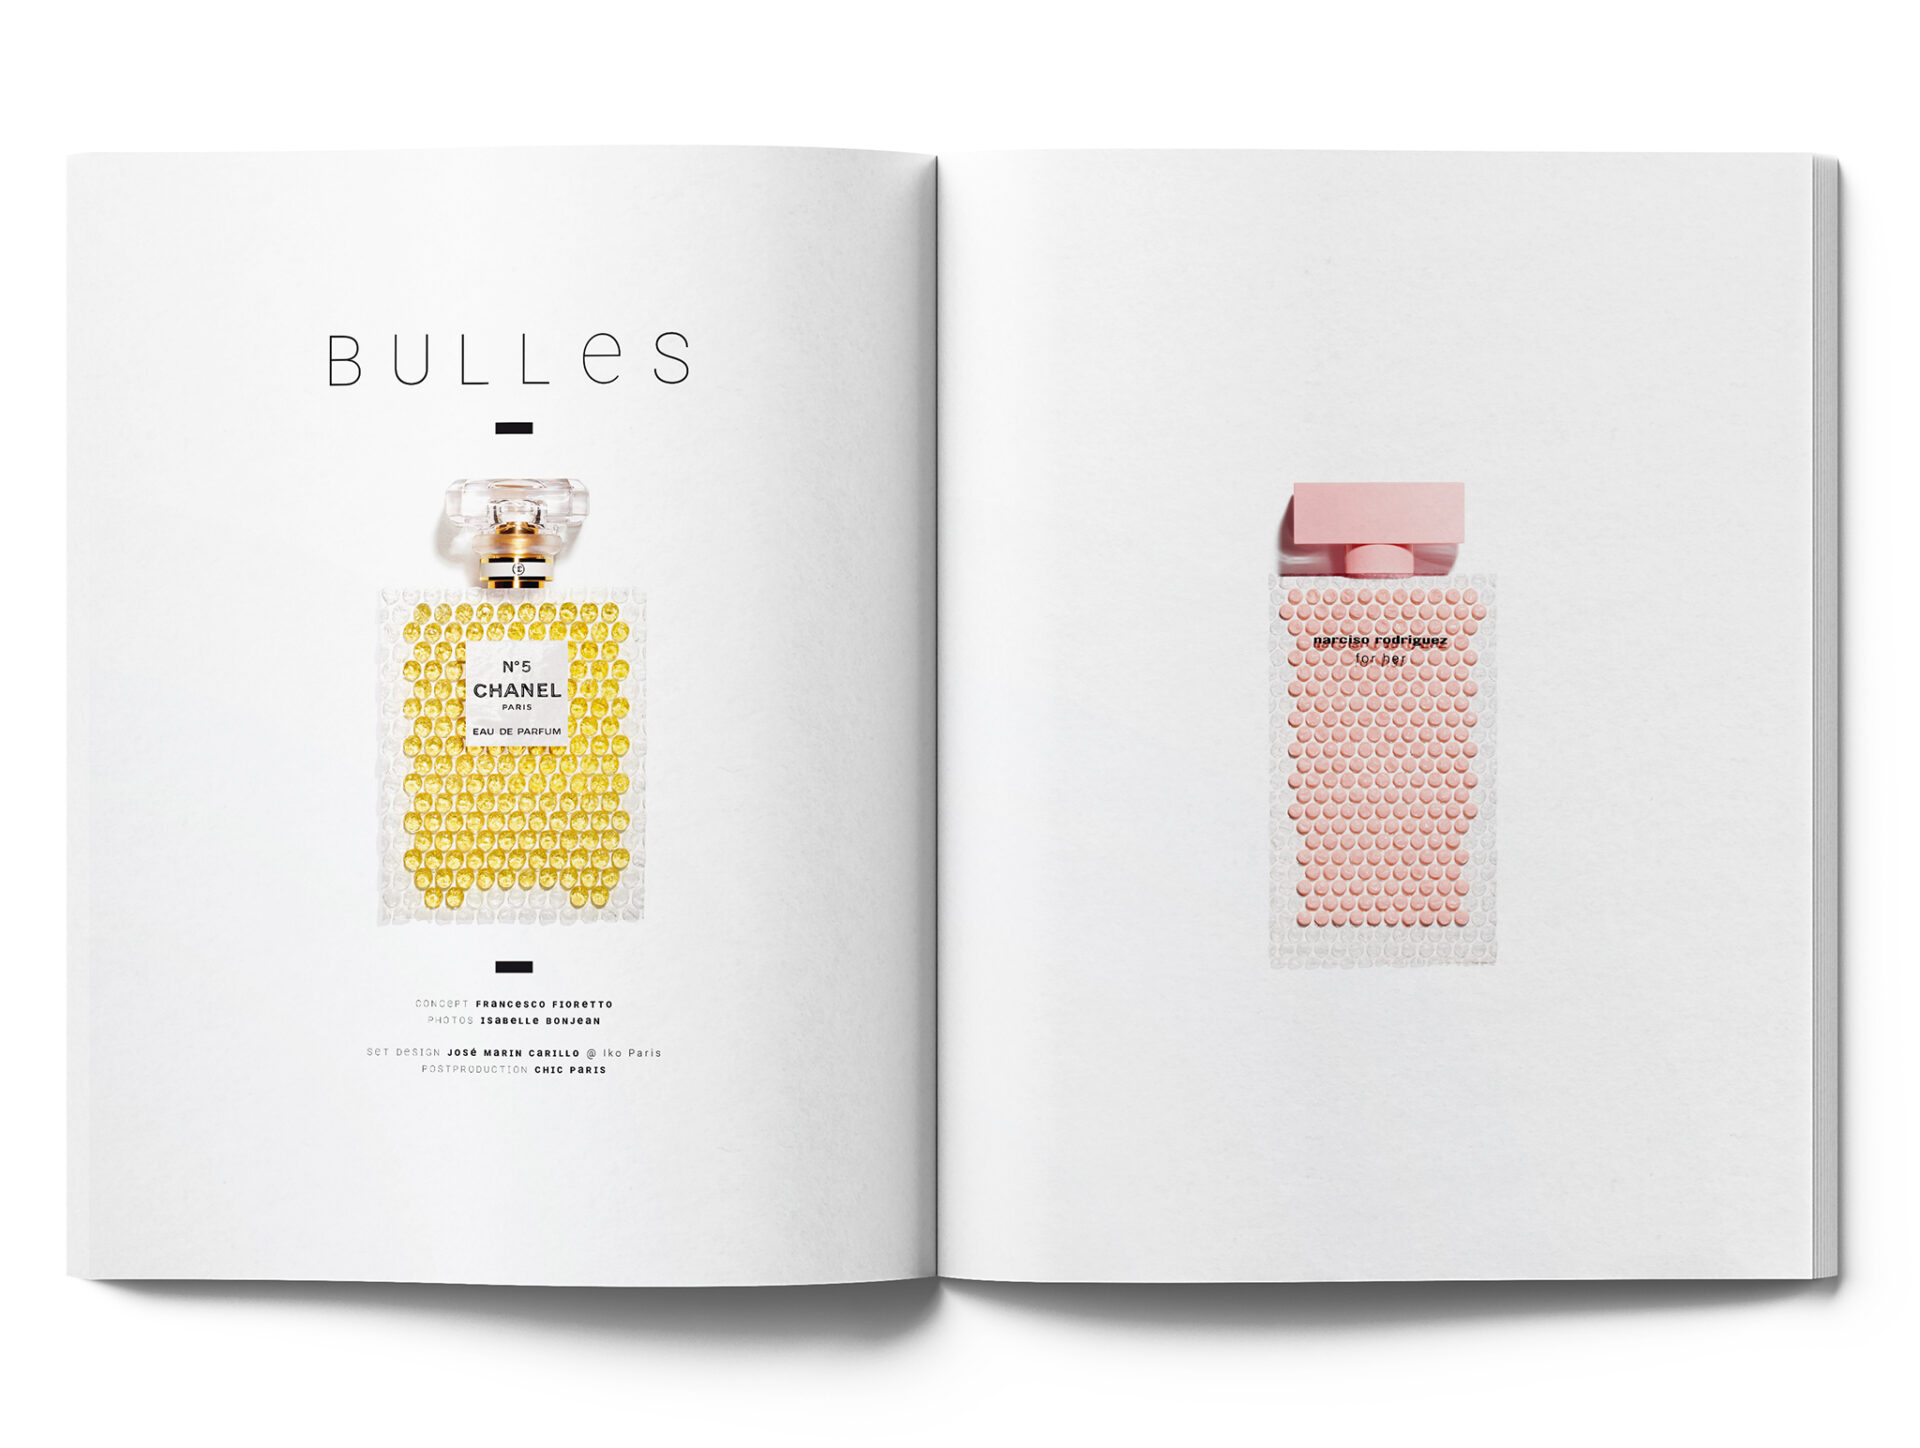 #12 Parfums Isabelle Bonjean